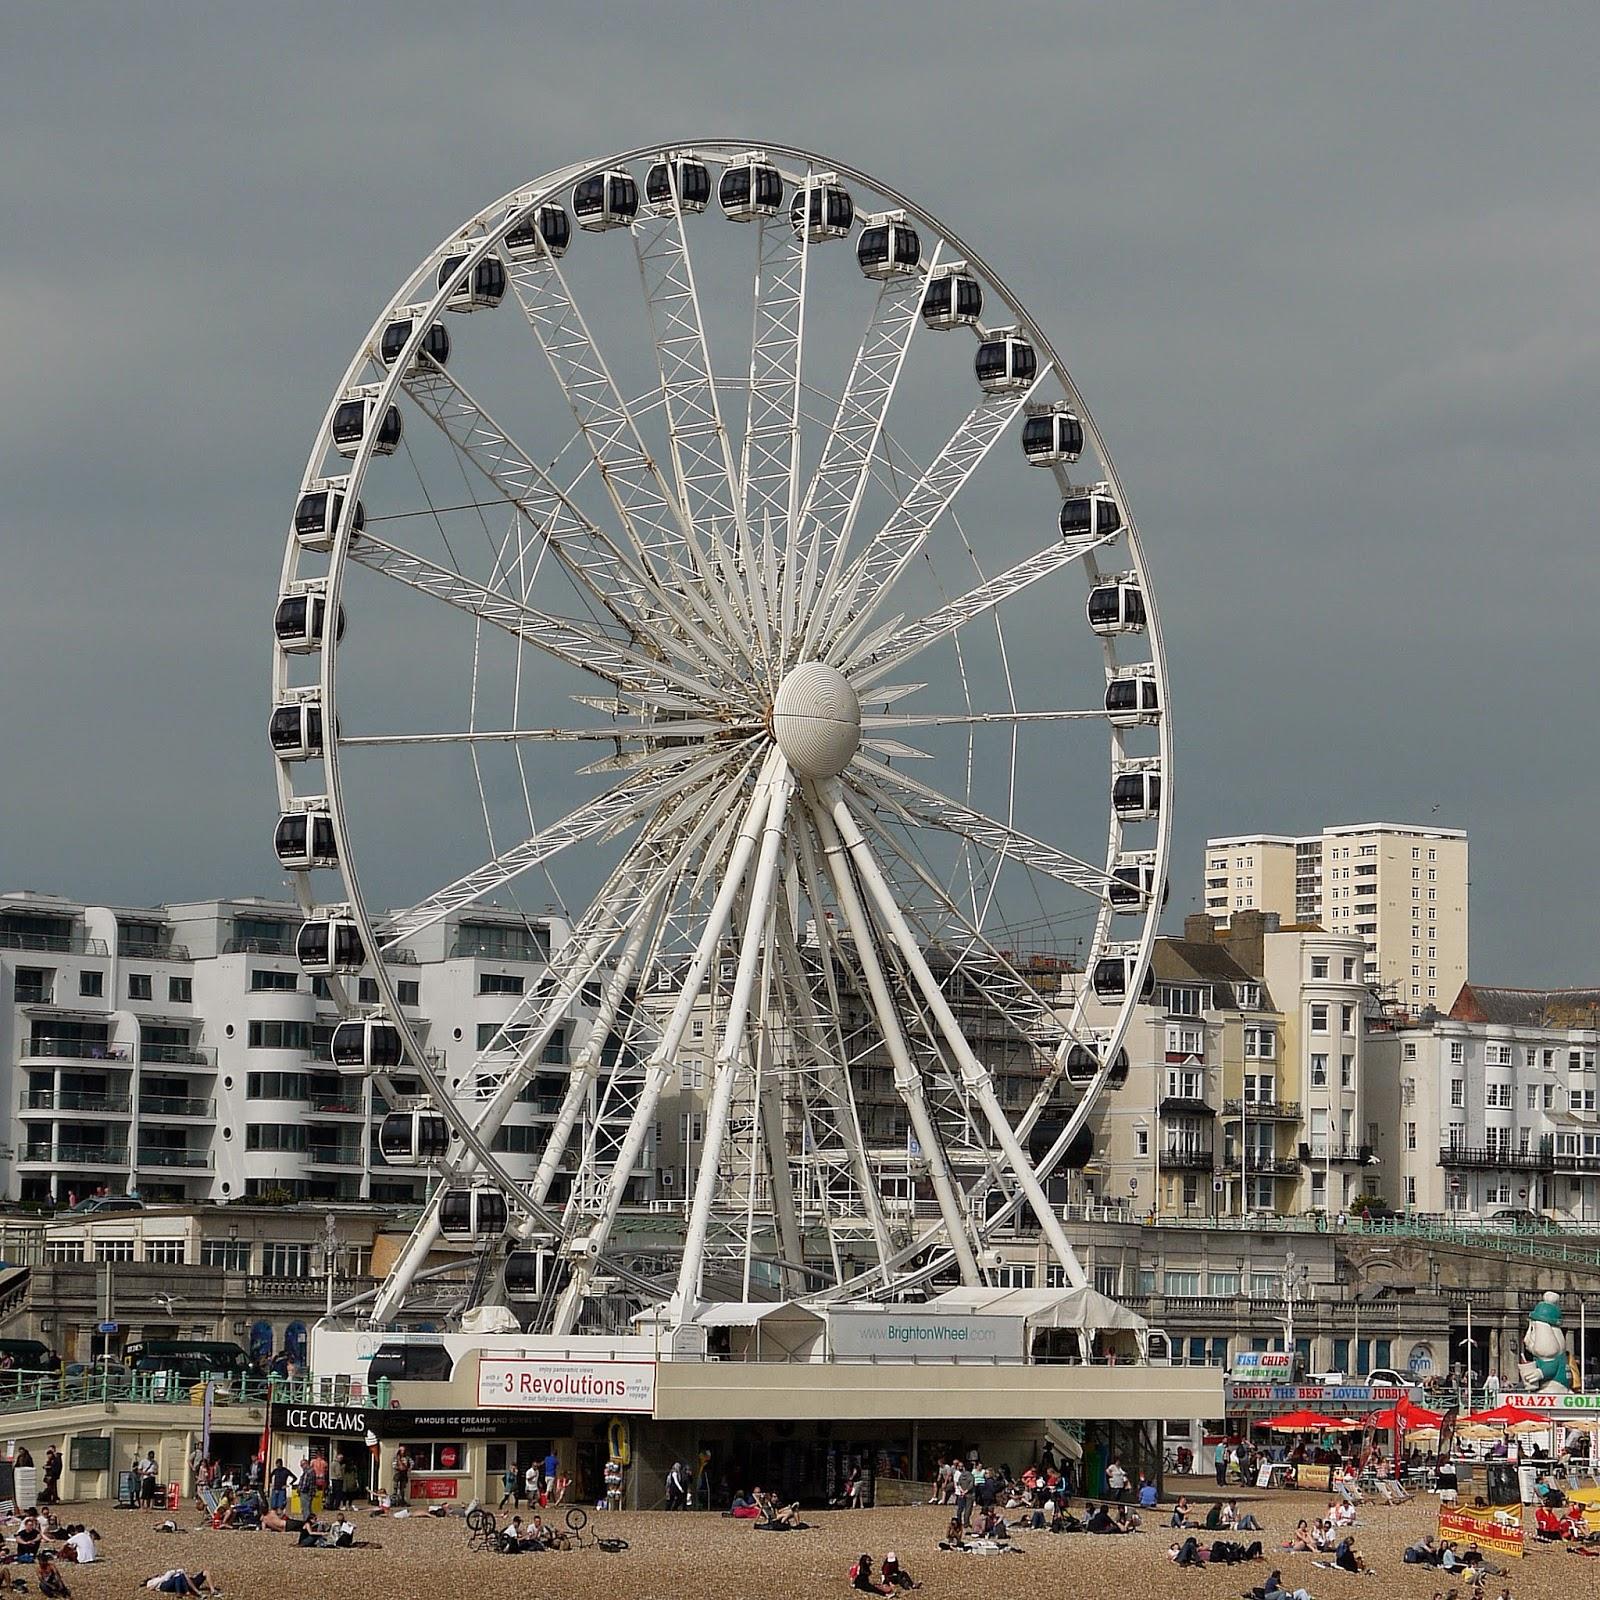 Brighton Wheel, Brighton, England